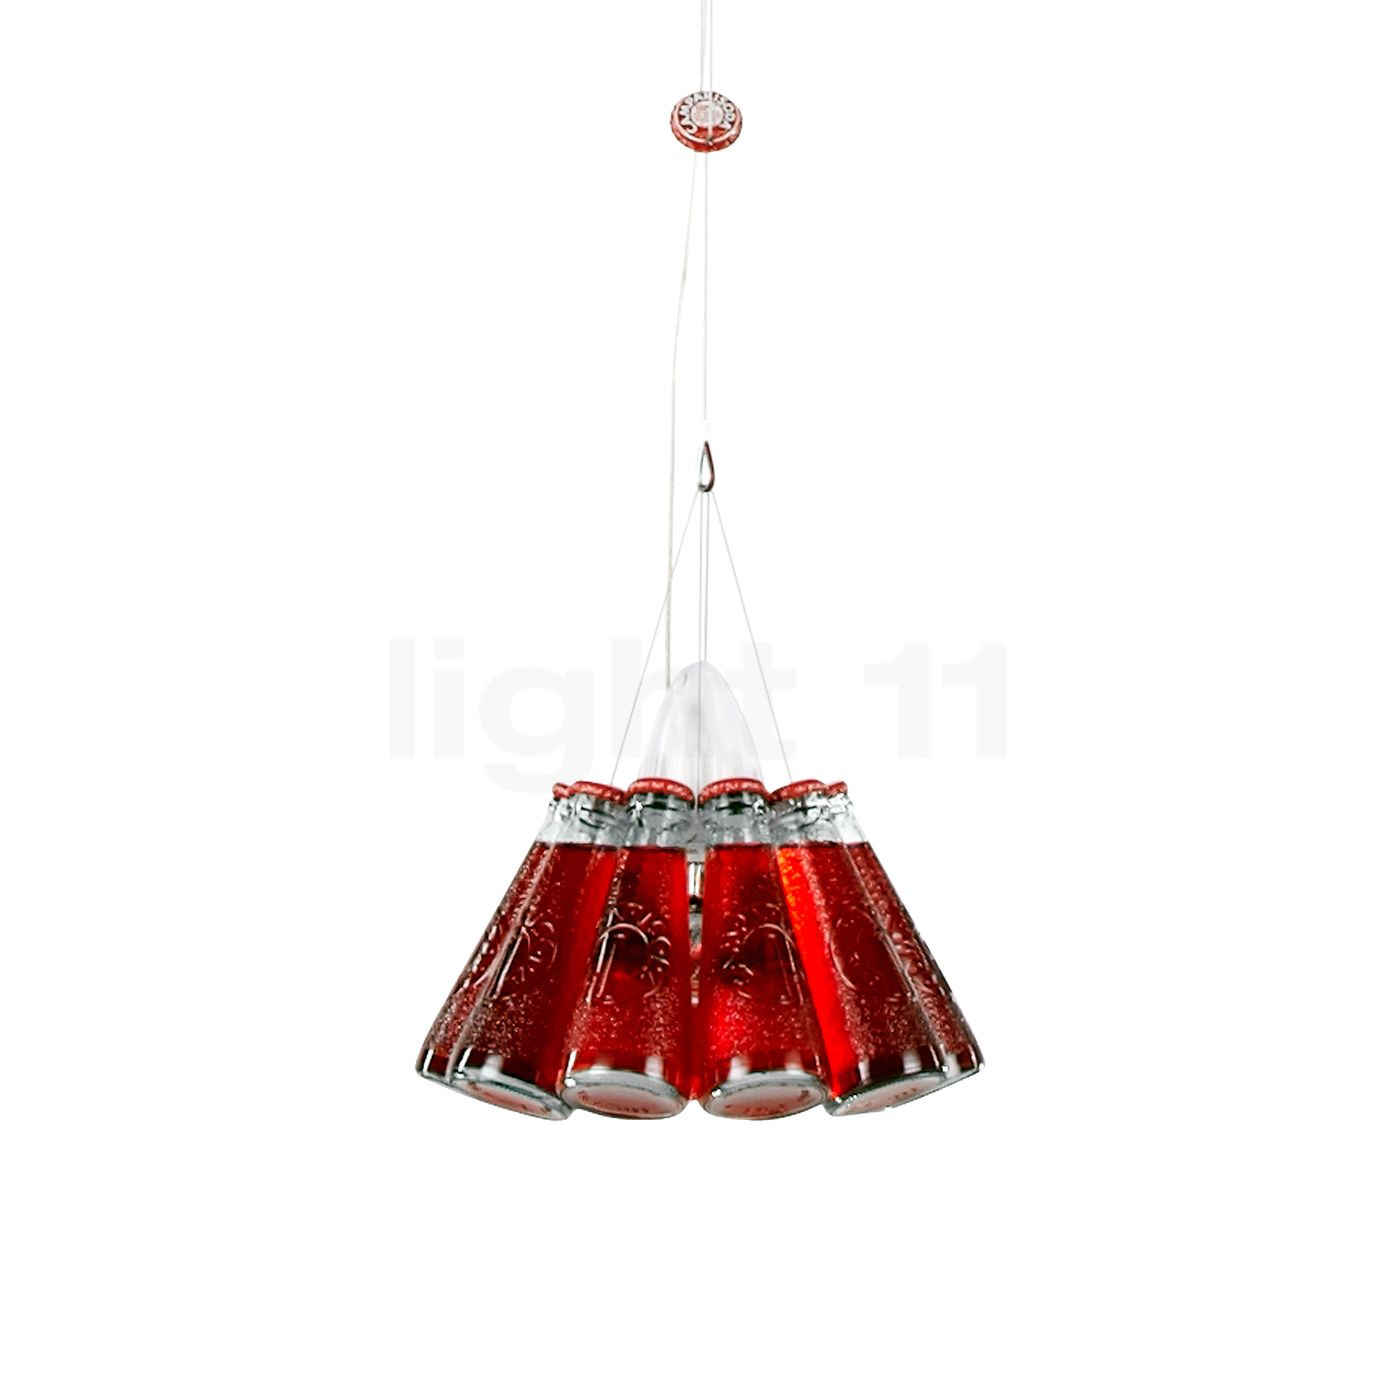 Ingo Maurer Campari Light 155 Pendant Lights Light11 Eu